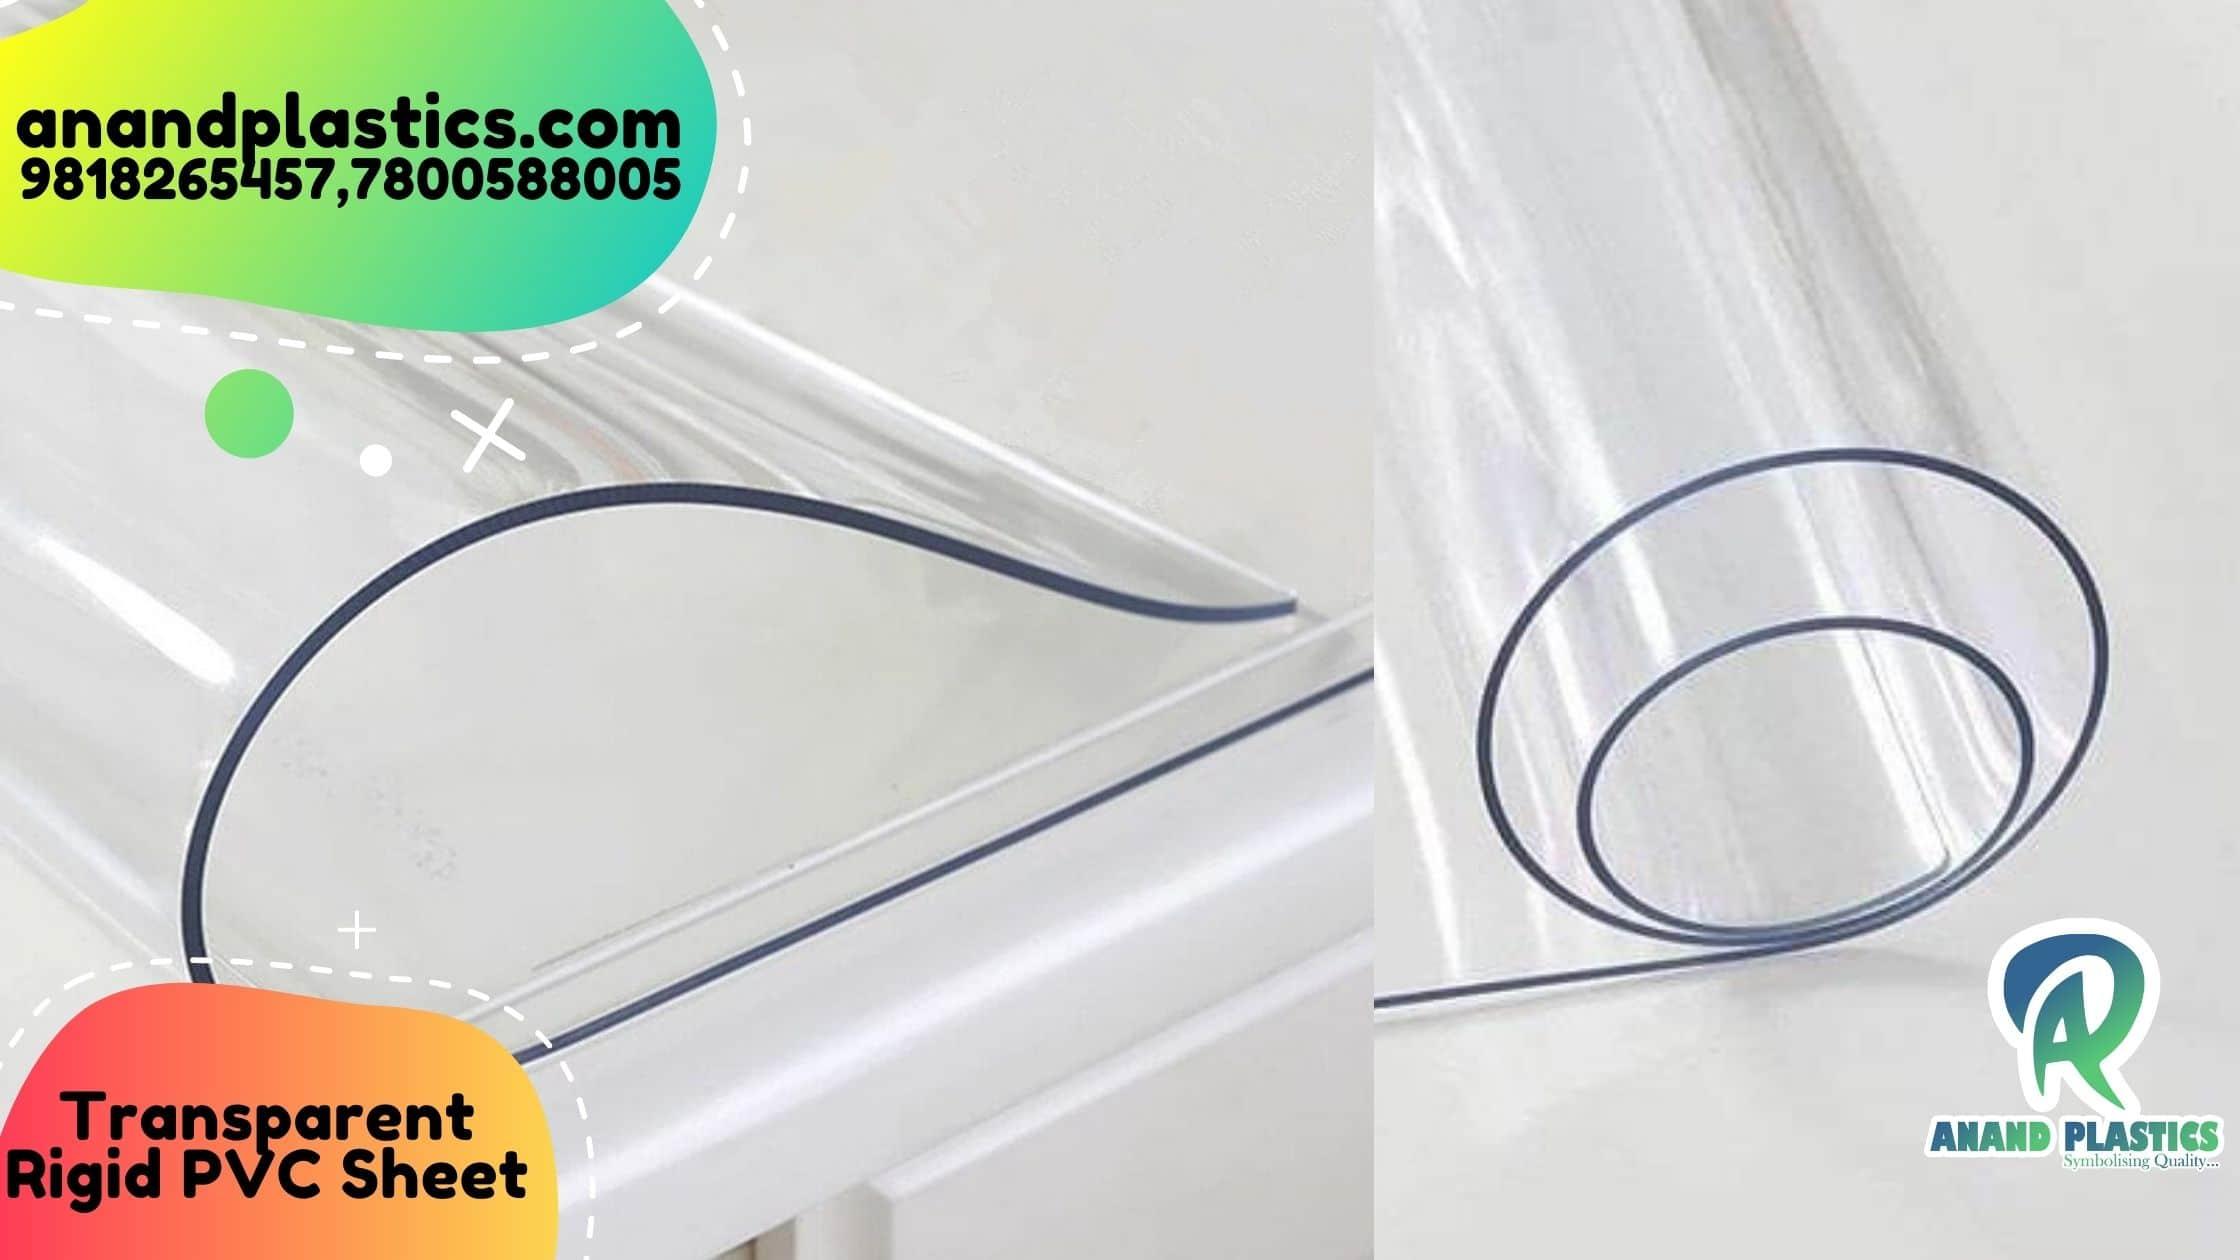 anand plastics, polycarbonate sheet, solid polycarbnoate sheet, multiwall polycarbonate sheet, roofing sheets, canopy sheet, plastic sheet, acrylic sheet, lgp, abs sheet, petg, sunboard, polystyrene sheets ,PVC SHEET